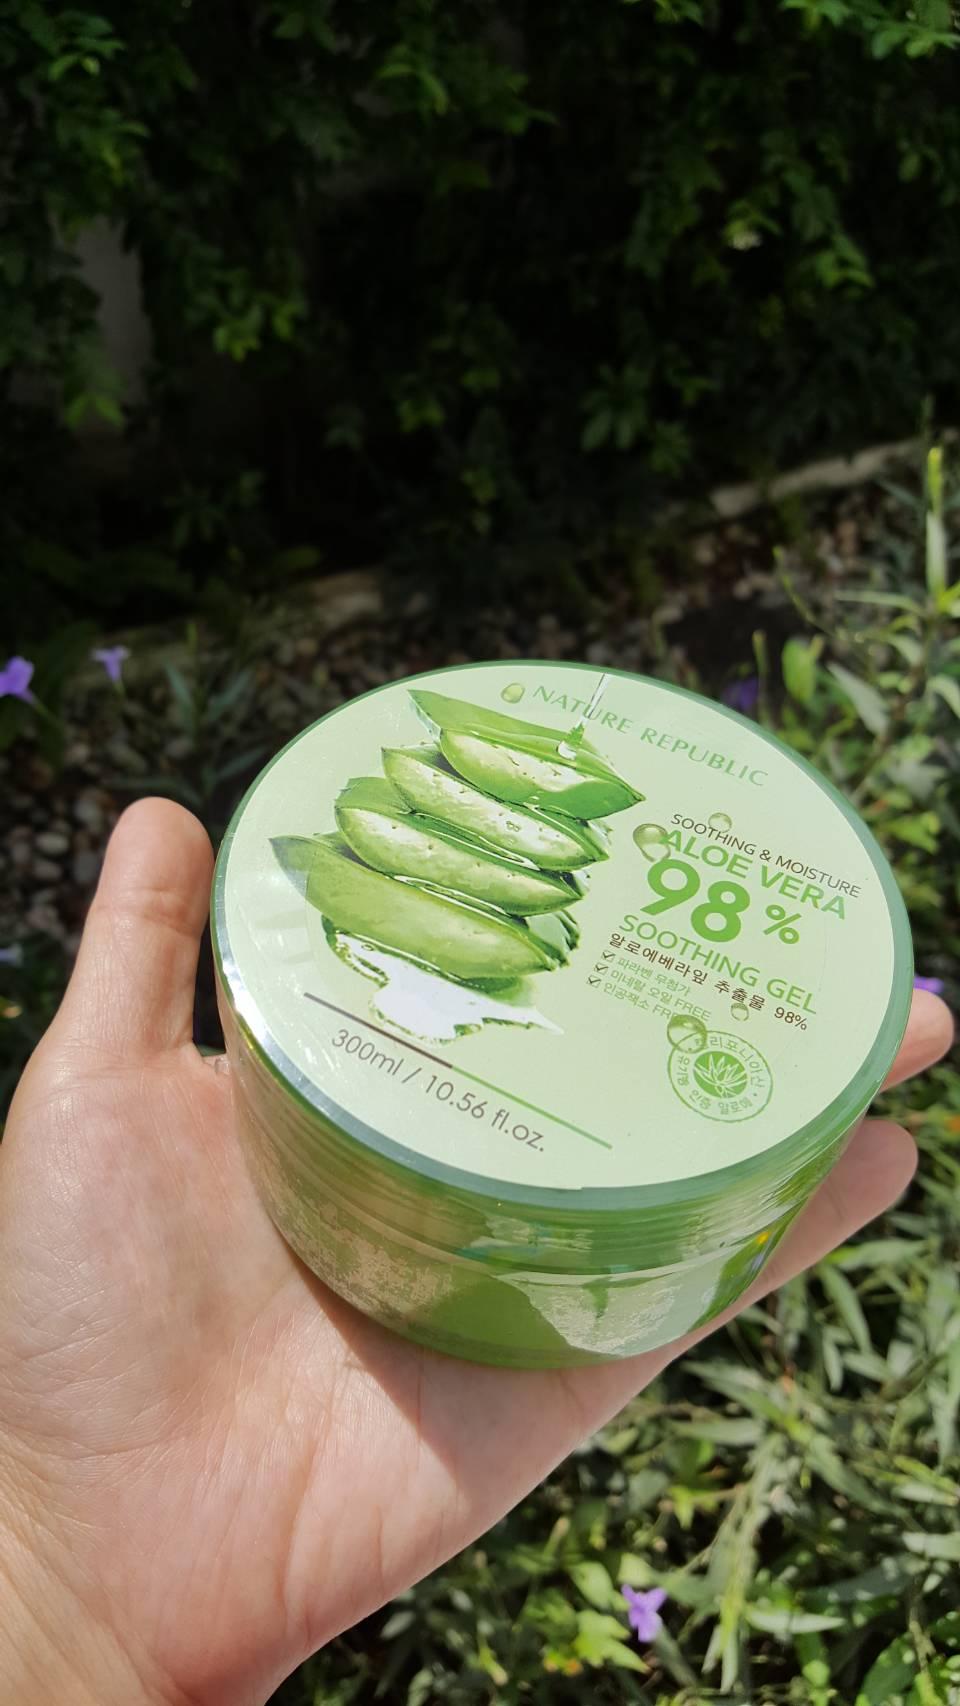 Nature Republic Aloe vera Soothing gel 98 ขนาด300ml เจลว่านหางจระเข้เอนกประสงค์